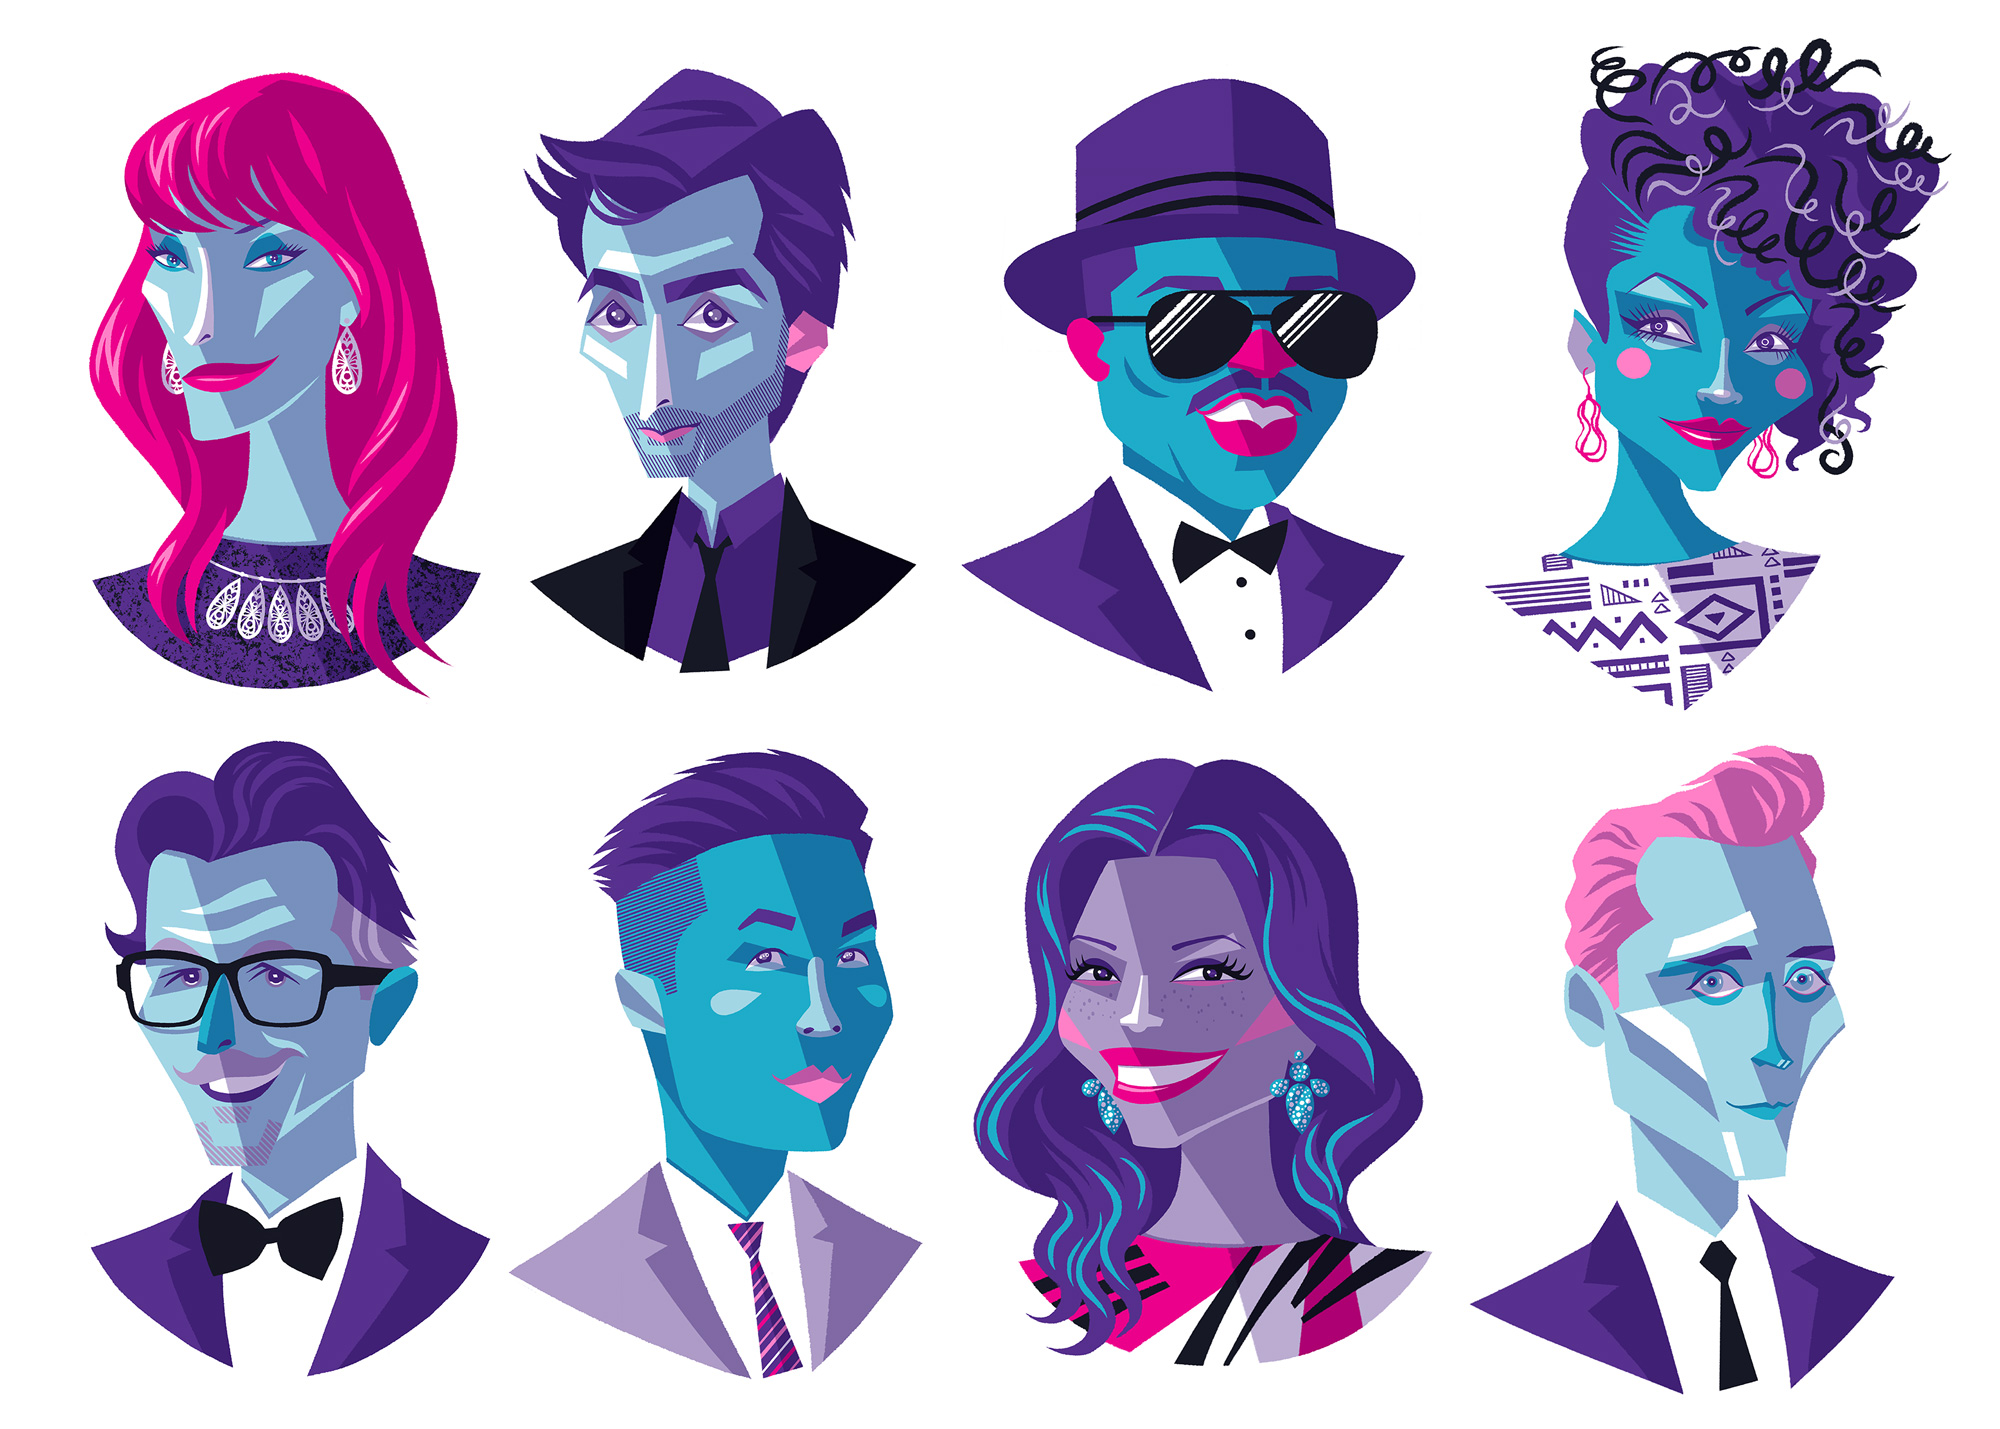 Tribeca Shortlist Portraits (Jane Seymour, David Tennant, Fab 5 Freddy, Yaya Dacosta, Gary Oldman, BD Wong, Andrea Navedo, and Tom Hiddleston)